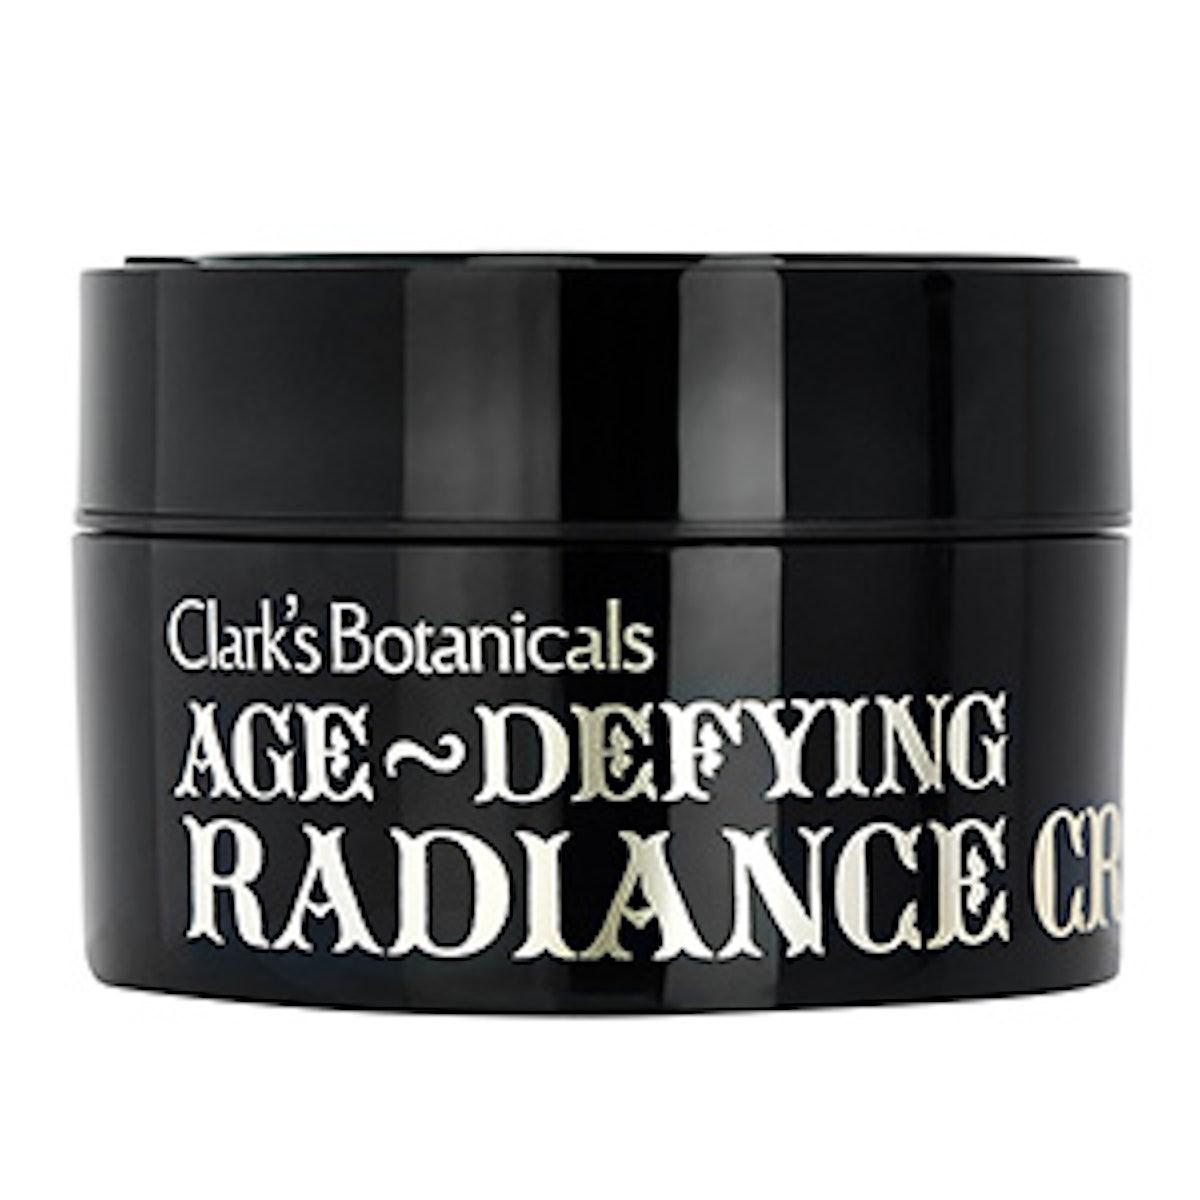 Age-Defying Radiance Cream